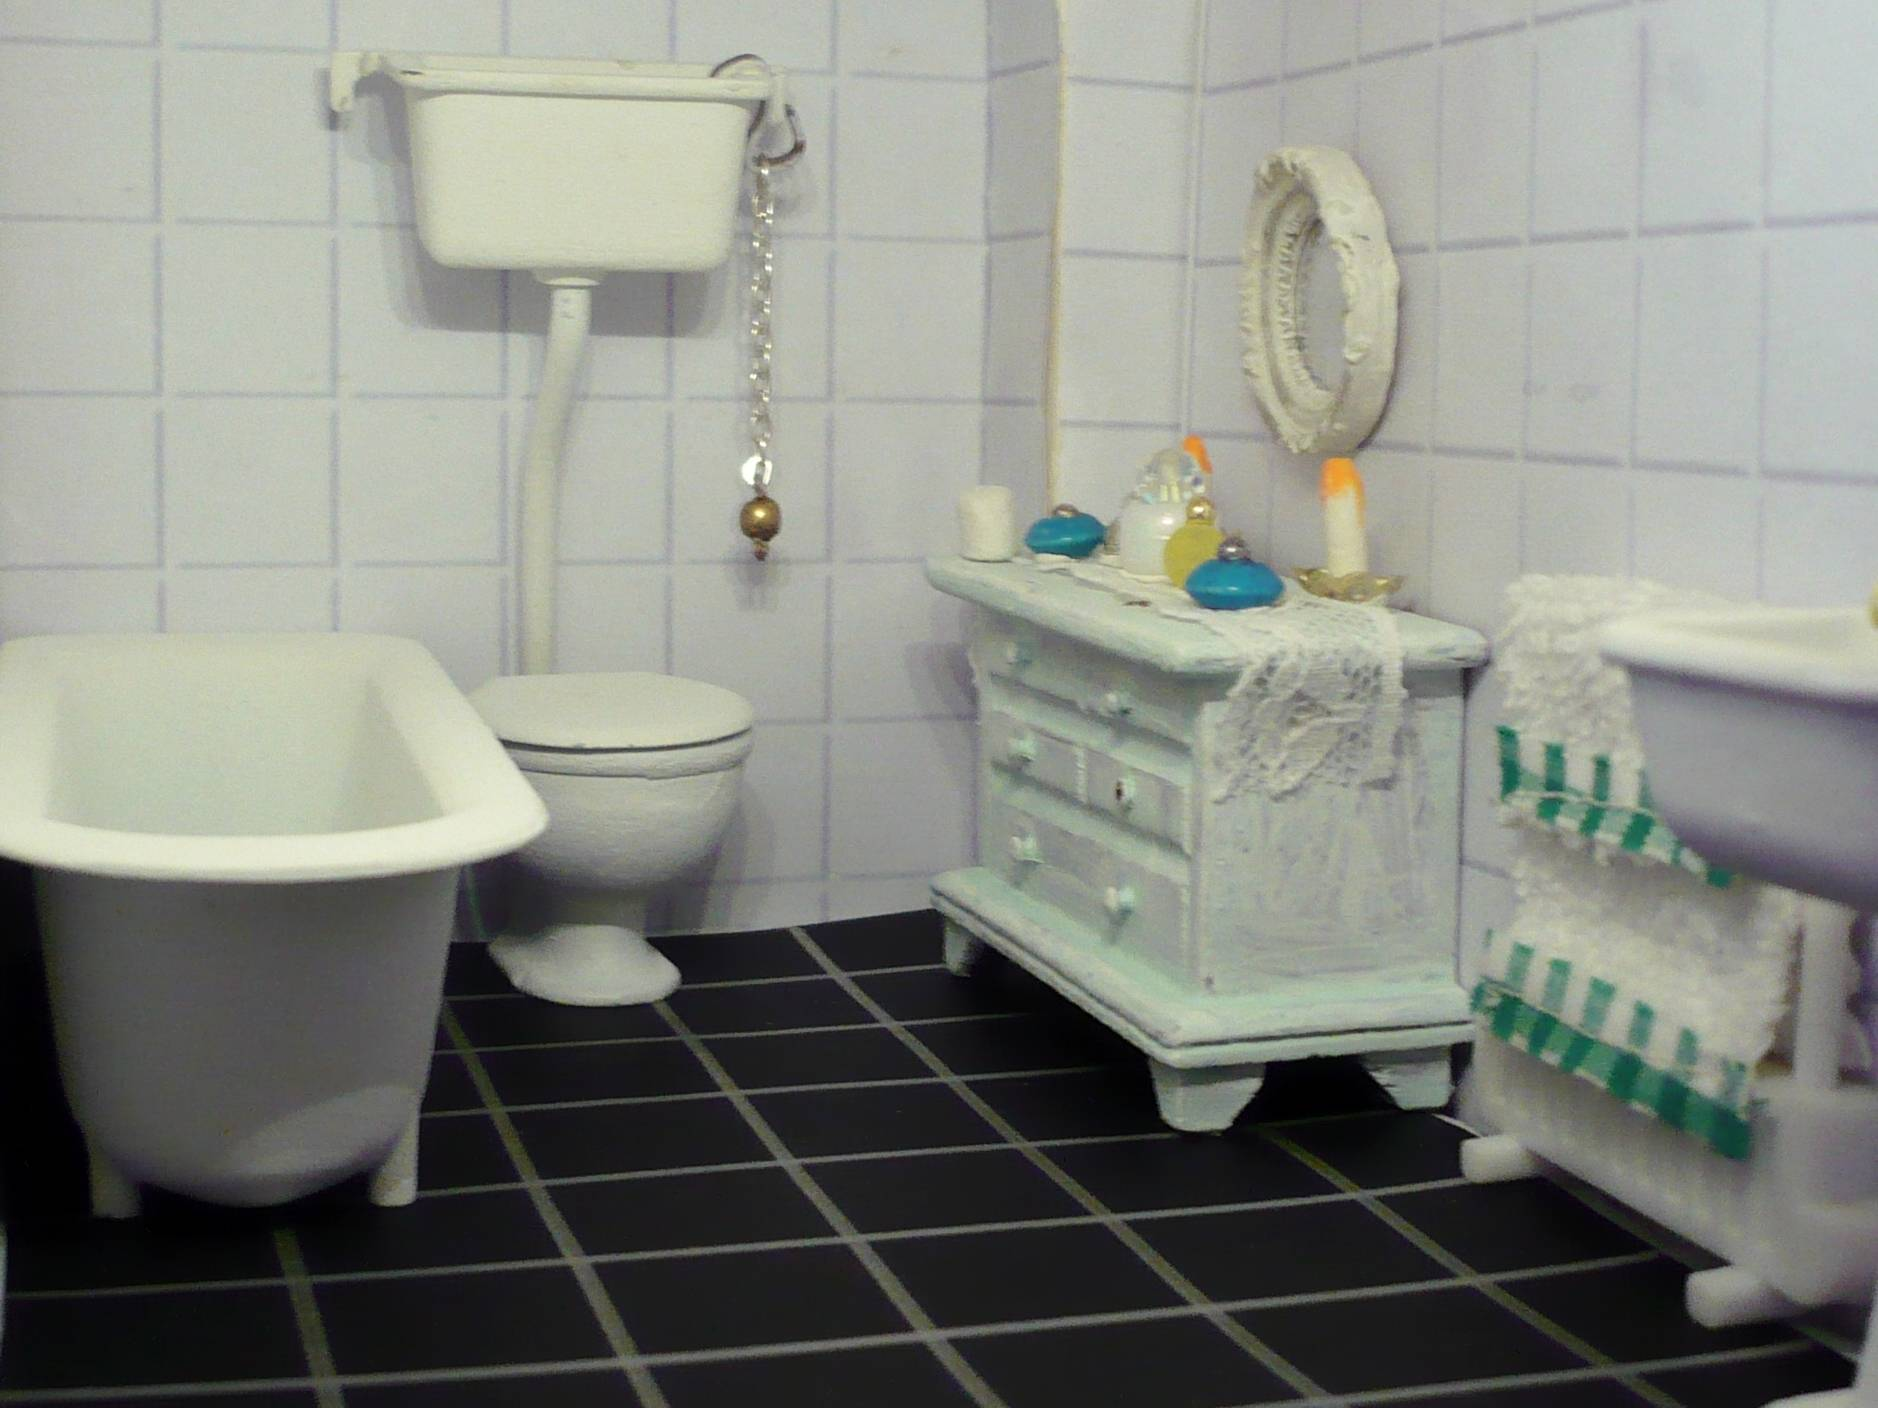 Changed the bathroom